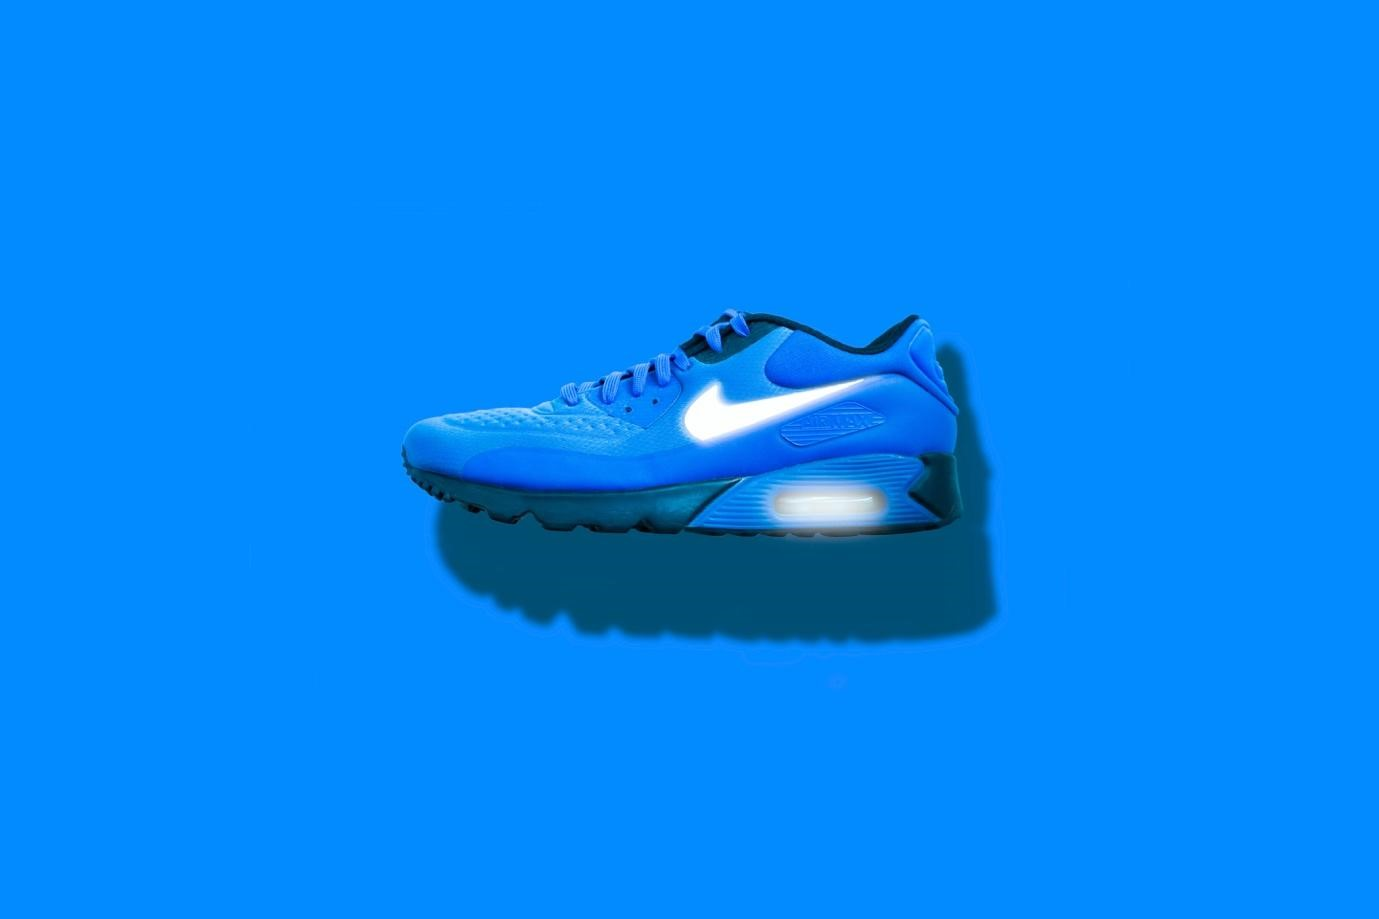 Adidasi Nike albastri